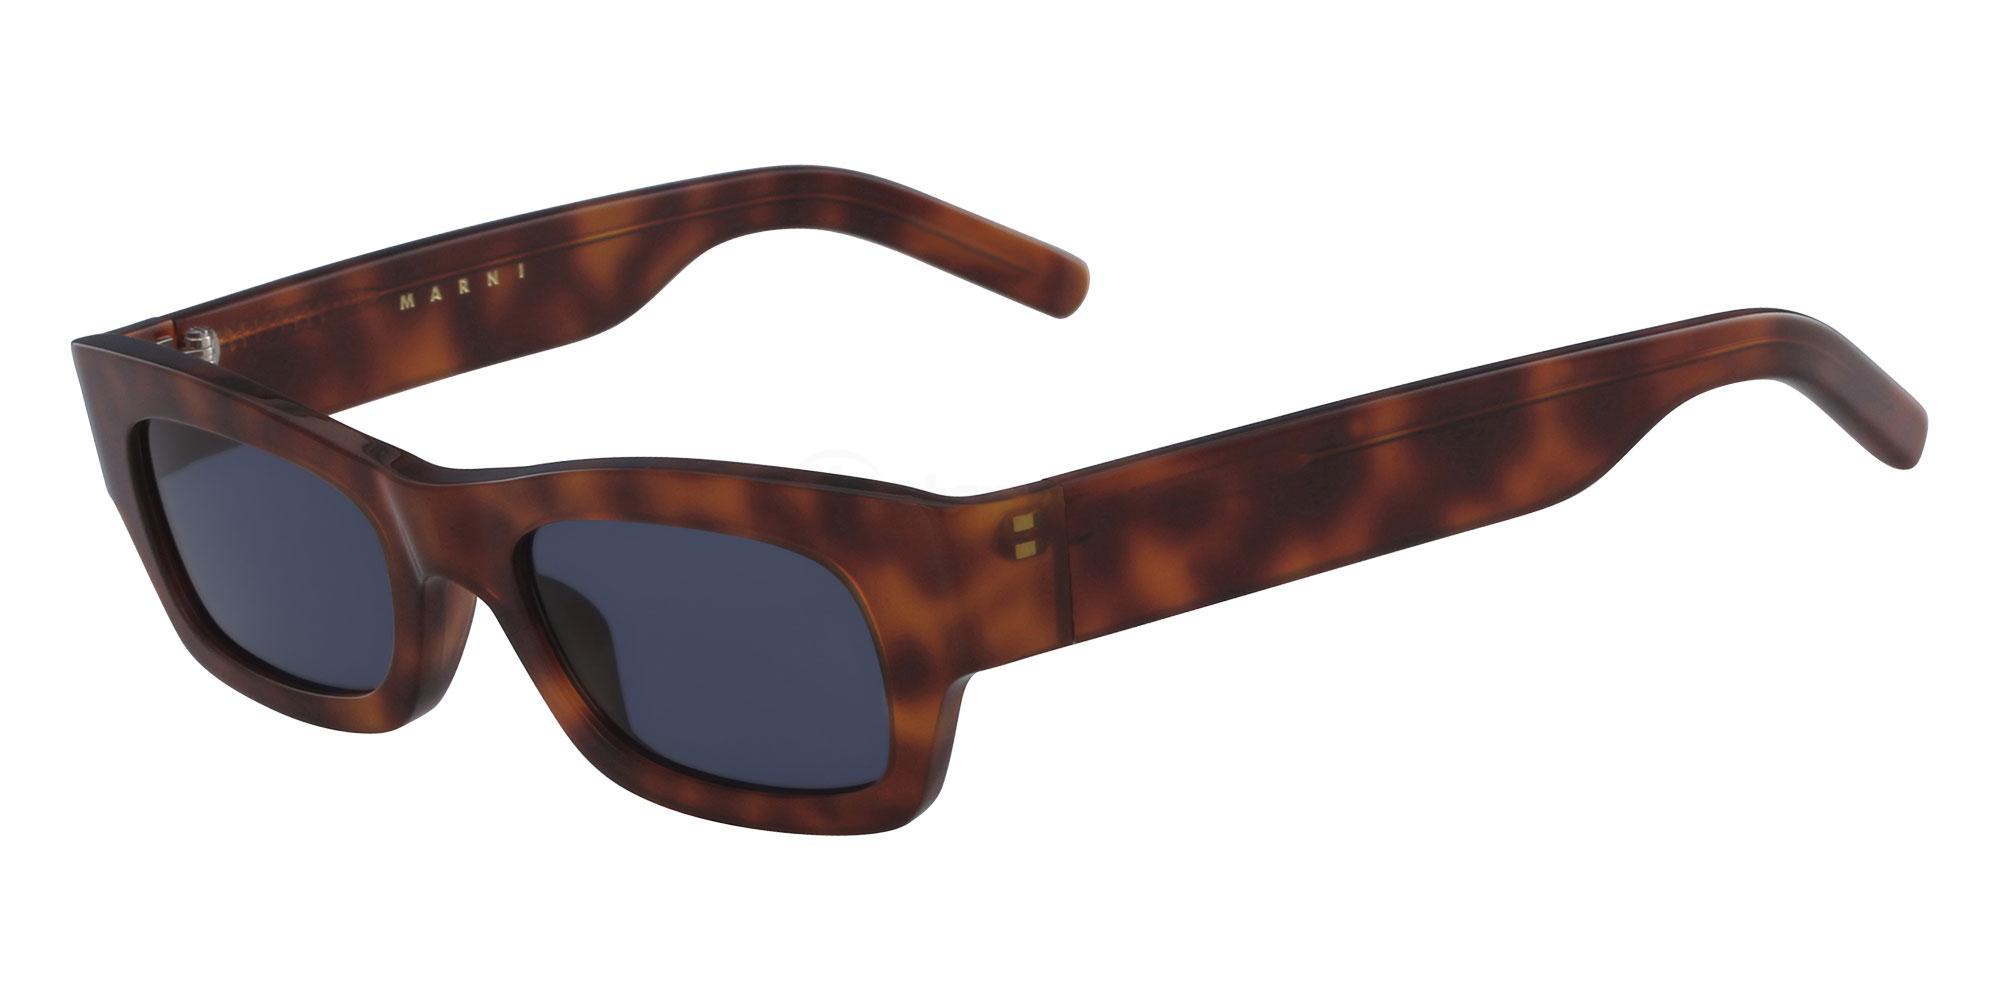 725 ME627S Sunglasses, Marni